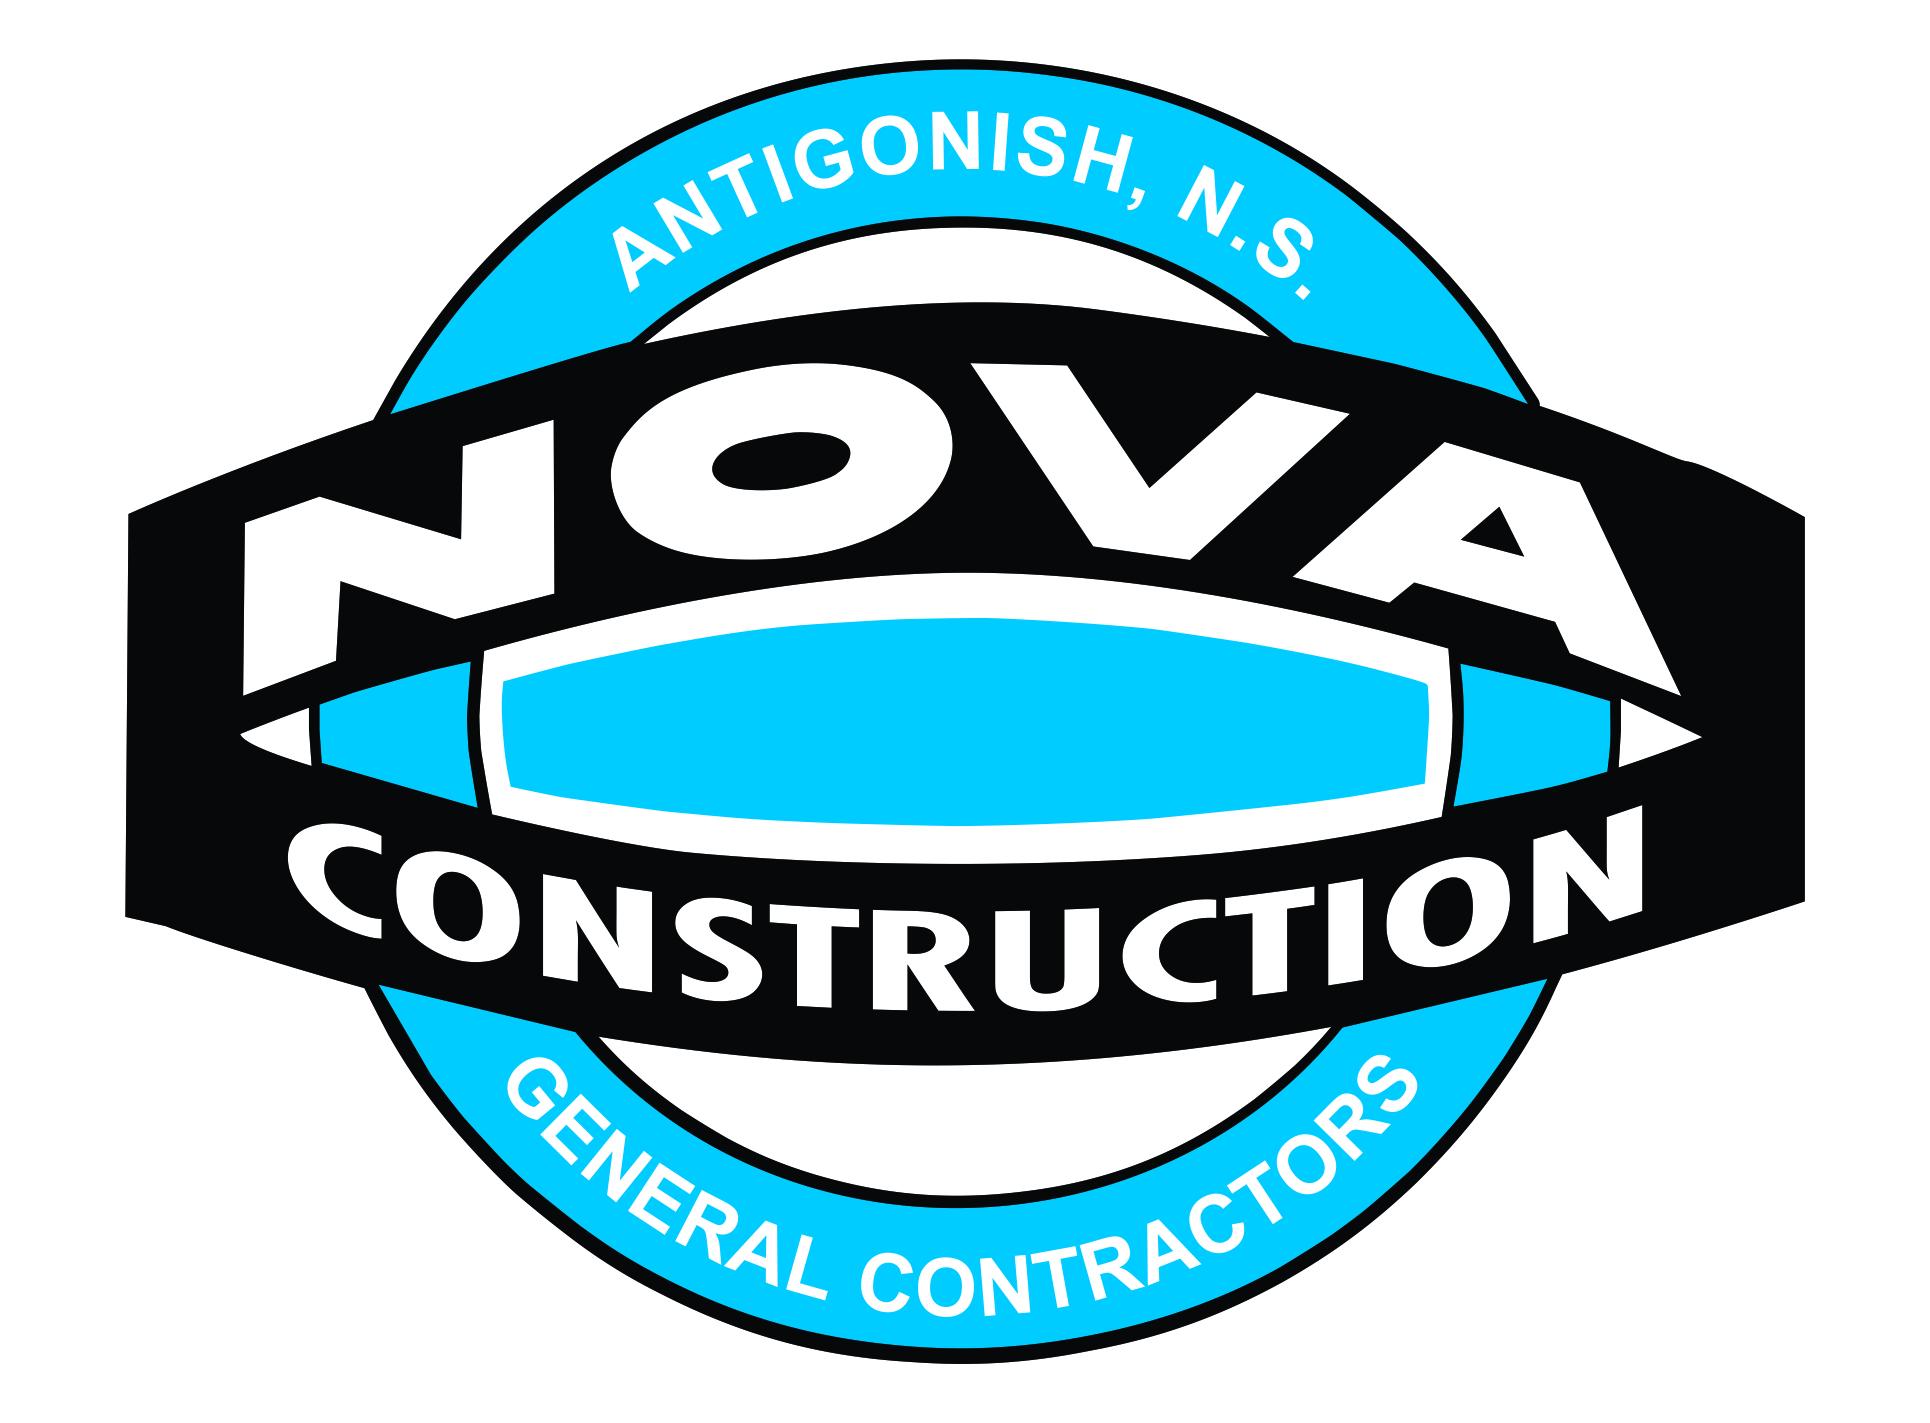 Nova Construction Co. Ltd's